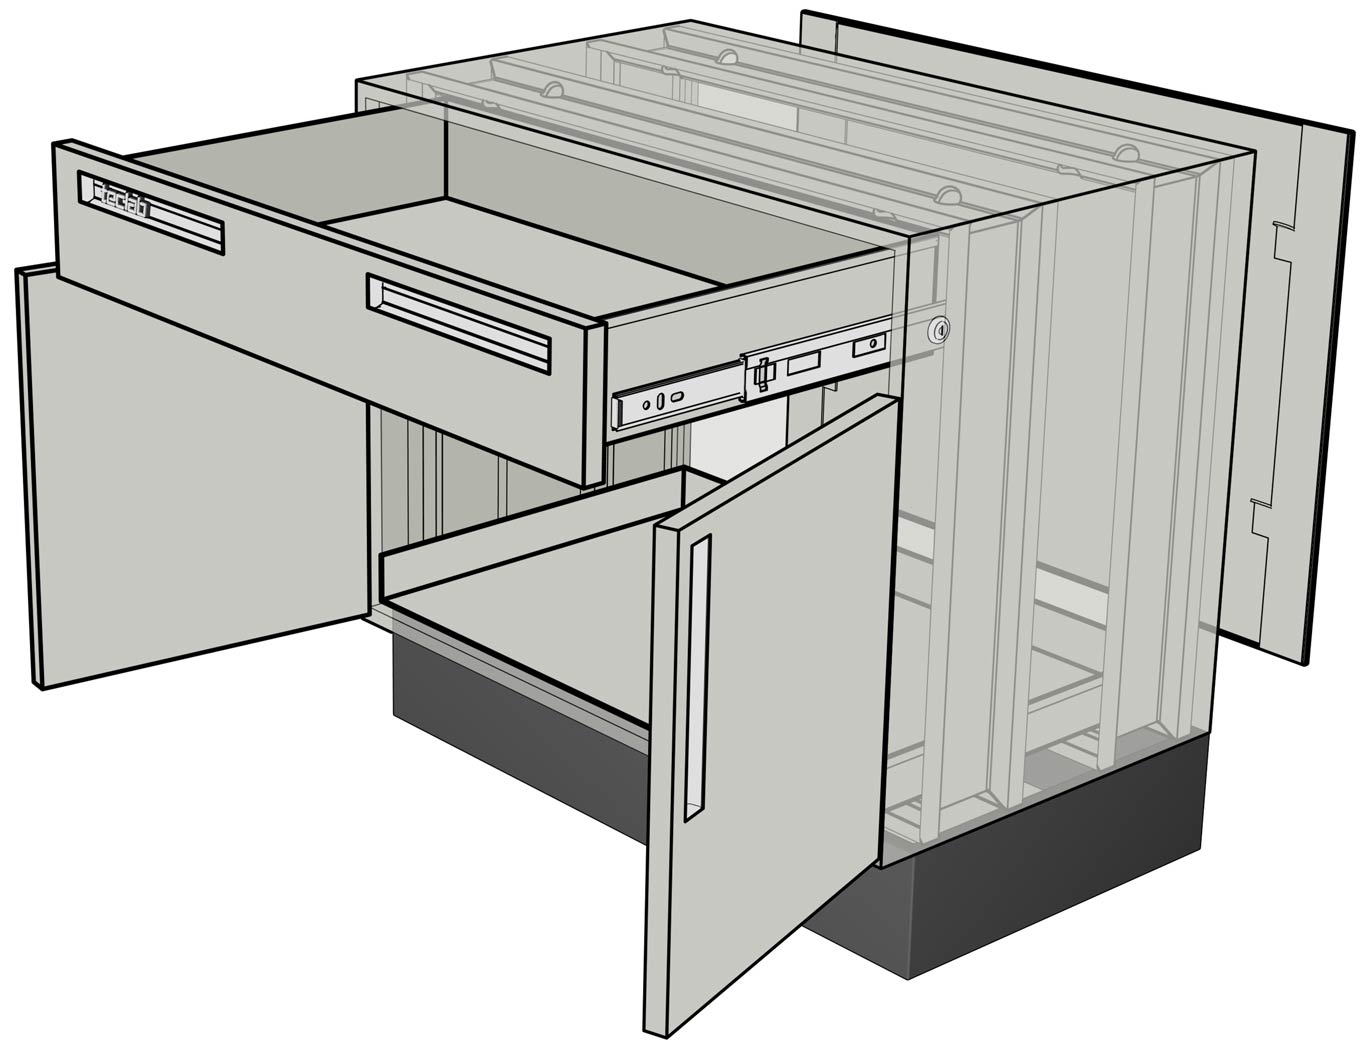 Teclab Base Cabinet Construction Details